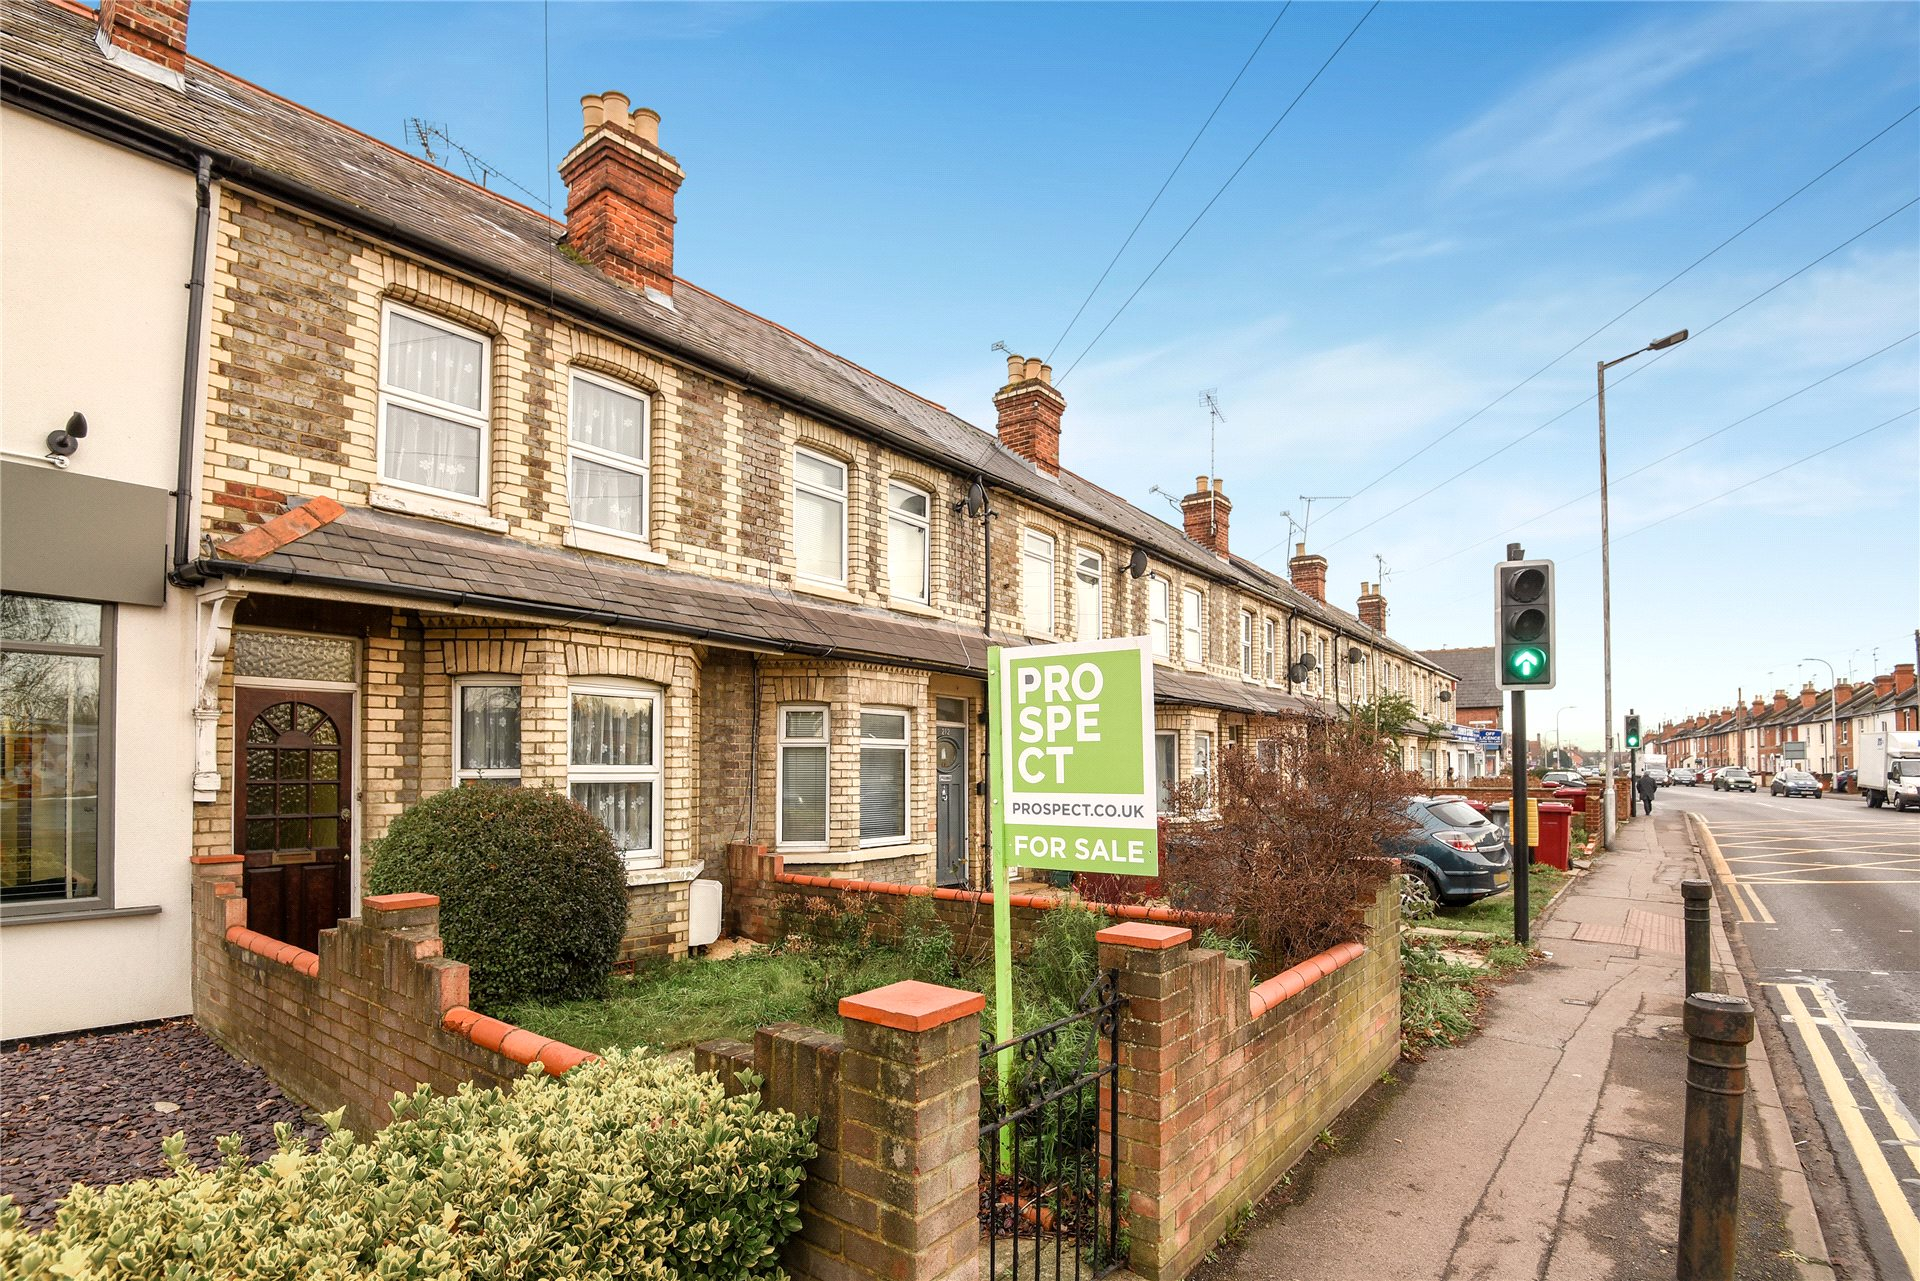 3 Bedrooms Terraced House for sale in Gosbrook Road, Caversham, Reading, Berkshire, RG4